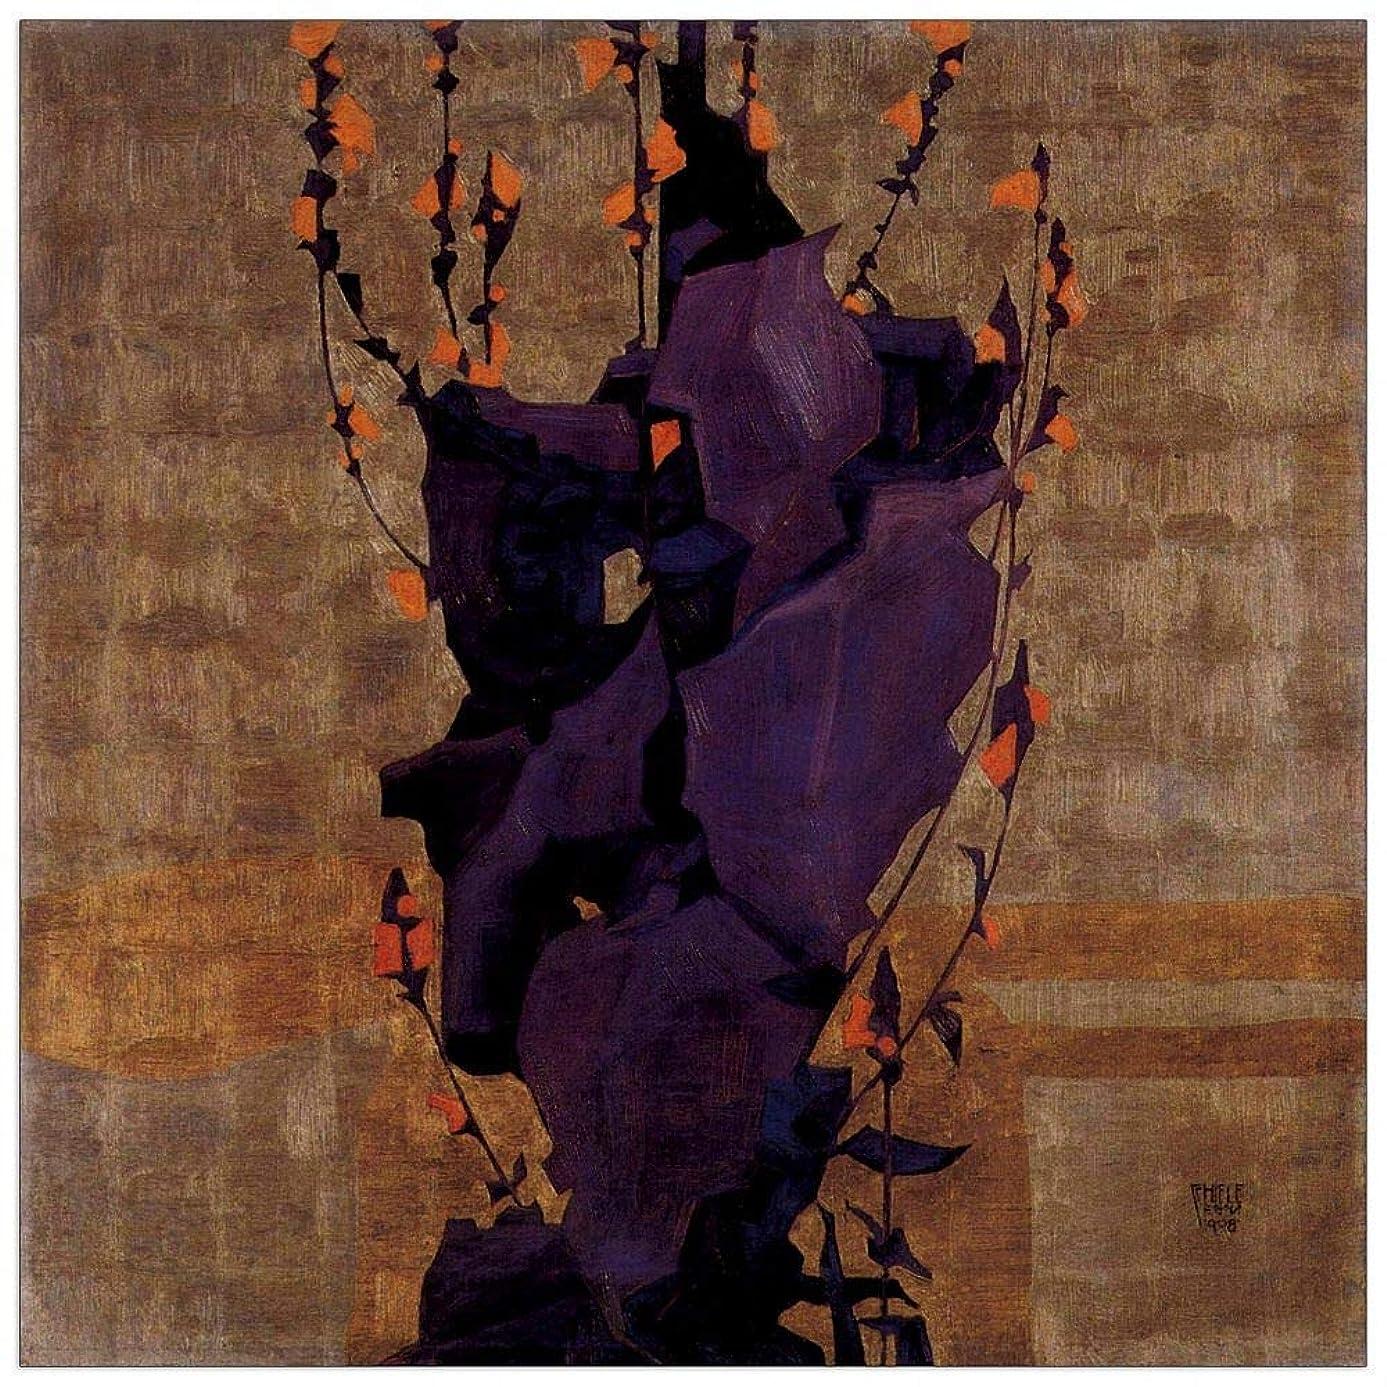 ArtPlaza TW91470 Schiele Egon-Stylized Floral Background, Style of Life Decorative Panel 31.5x31.5 Inch Multicolored